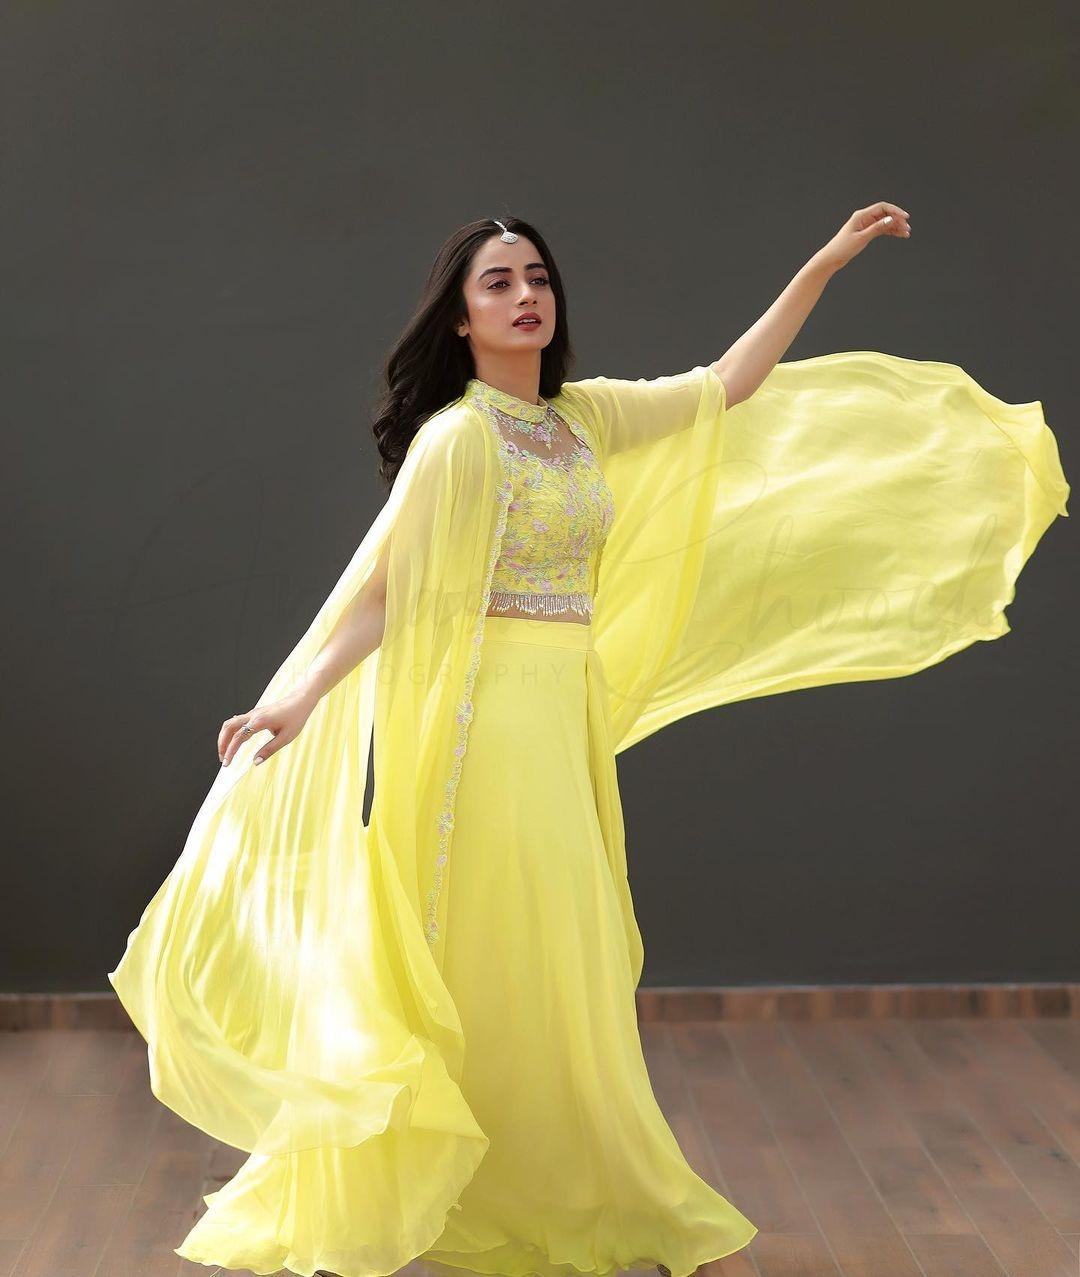 Namitha Pramod in lemon yellow outfit by Jeune Maree4